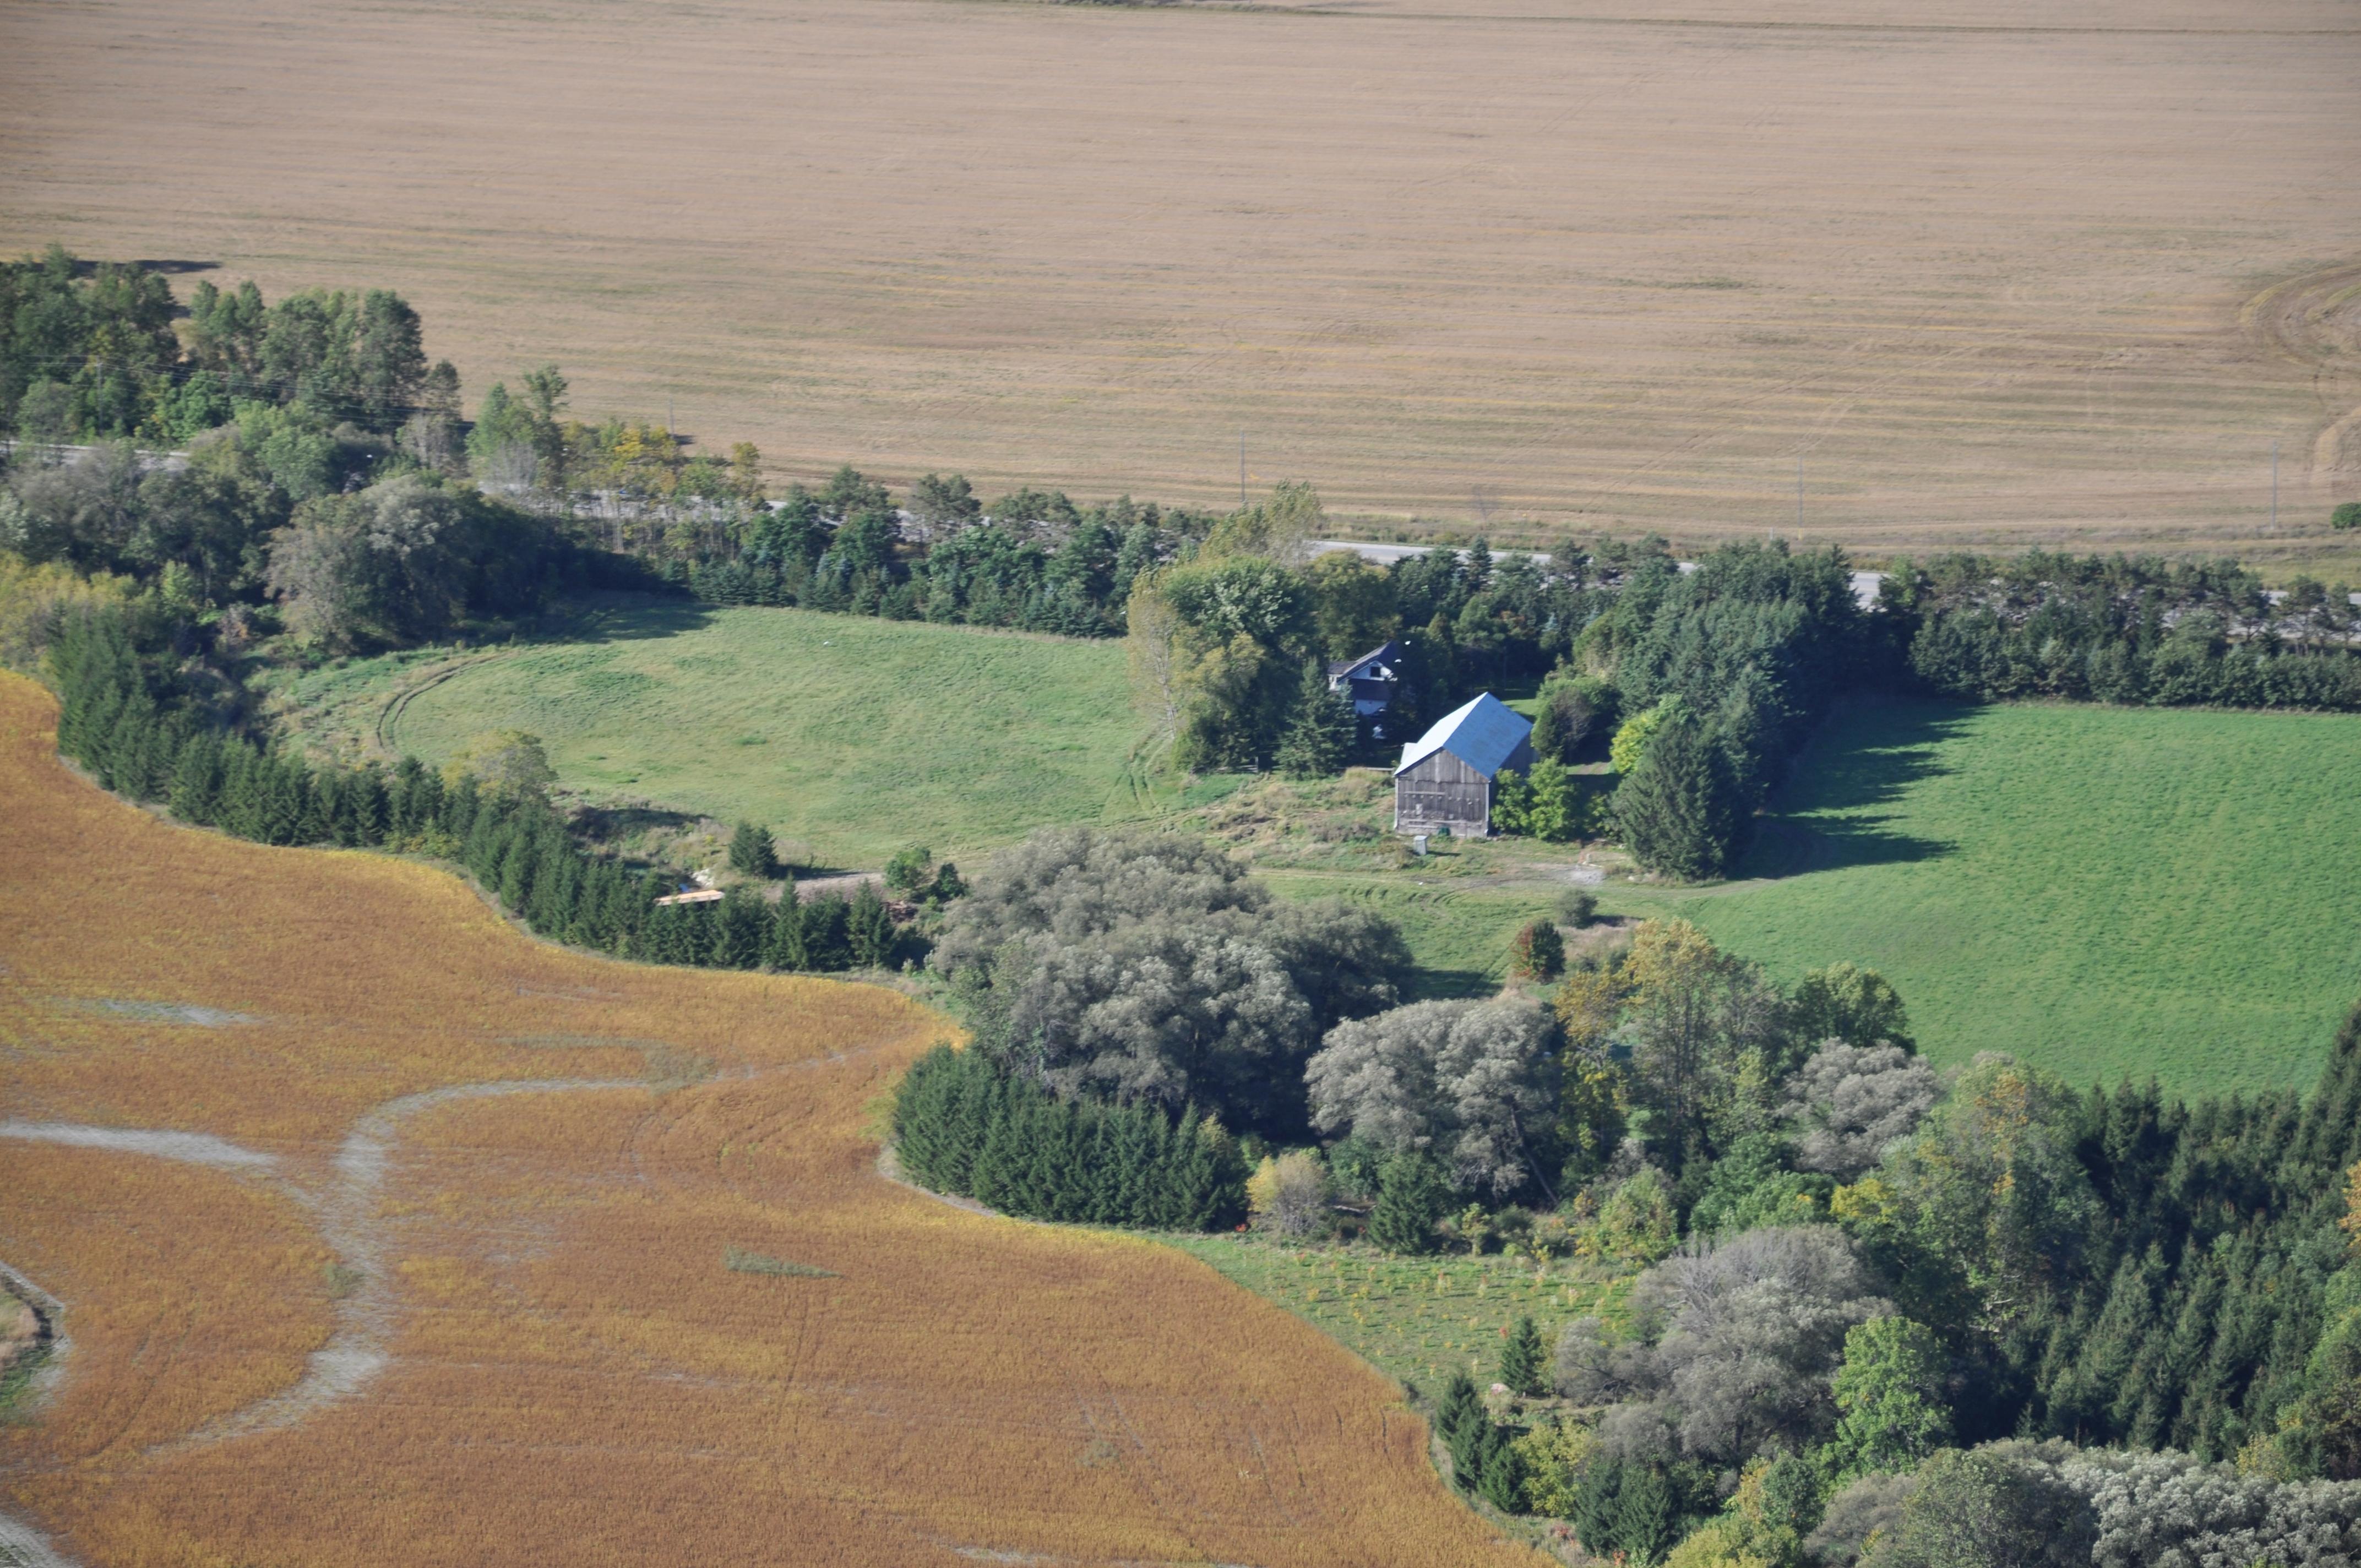 Farmland near Waverley Uplands Moraine -J.E. (Jim) Simpson photo